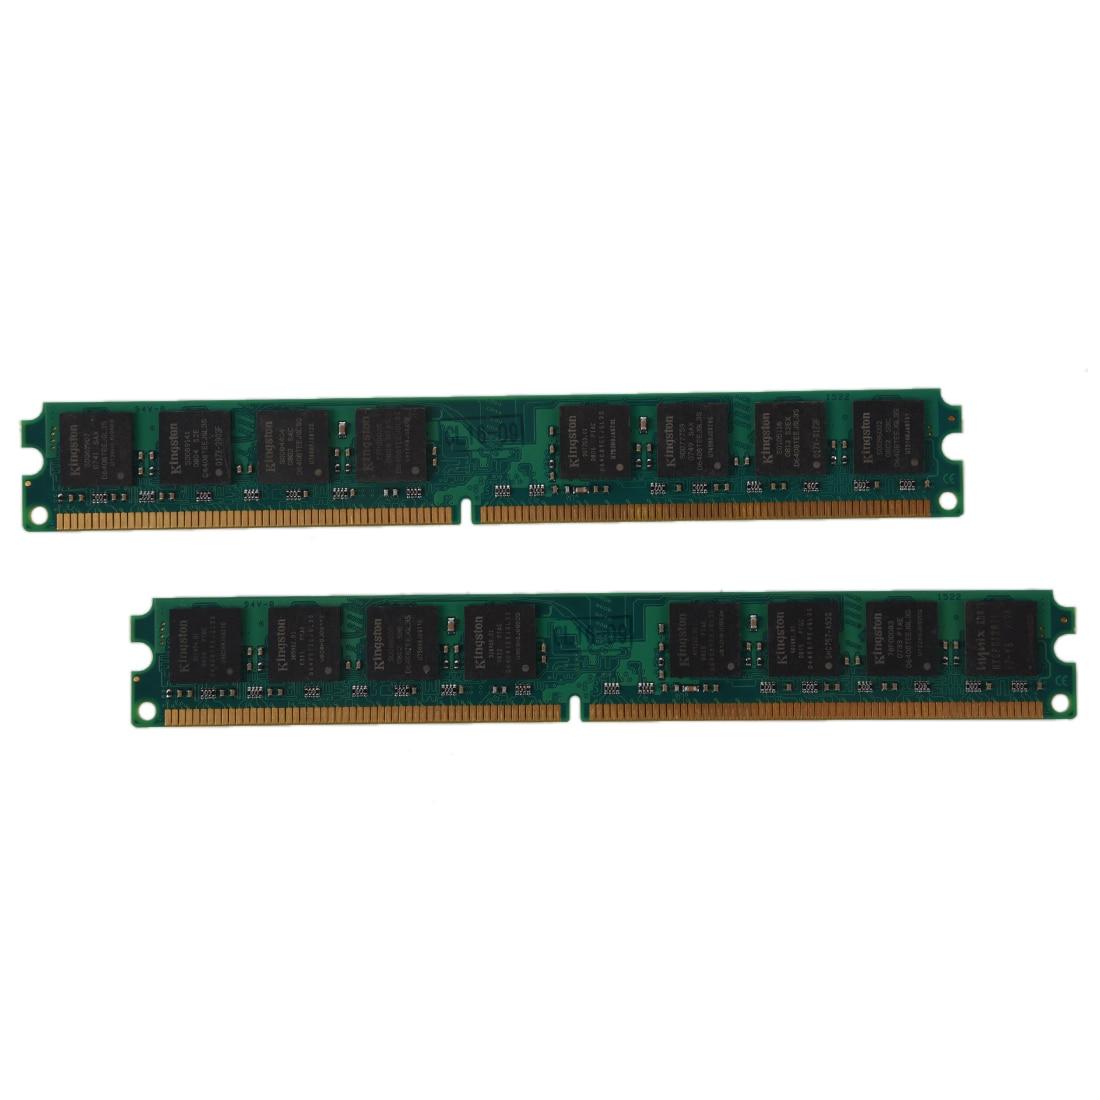 2GB (2X1 GB) DDR2 533 MHZ PC2 4200 240 pines DIMM memoria RAM PC de escritorio NON-ECC Kembona original chips marca PC de escritorio DDR2 1 GB/2 GB/4 GB 800 MHz/667 MHz/533 MHz DDR 2 DIMM-240-Pins escritorio memoria Ram